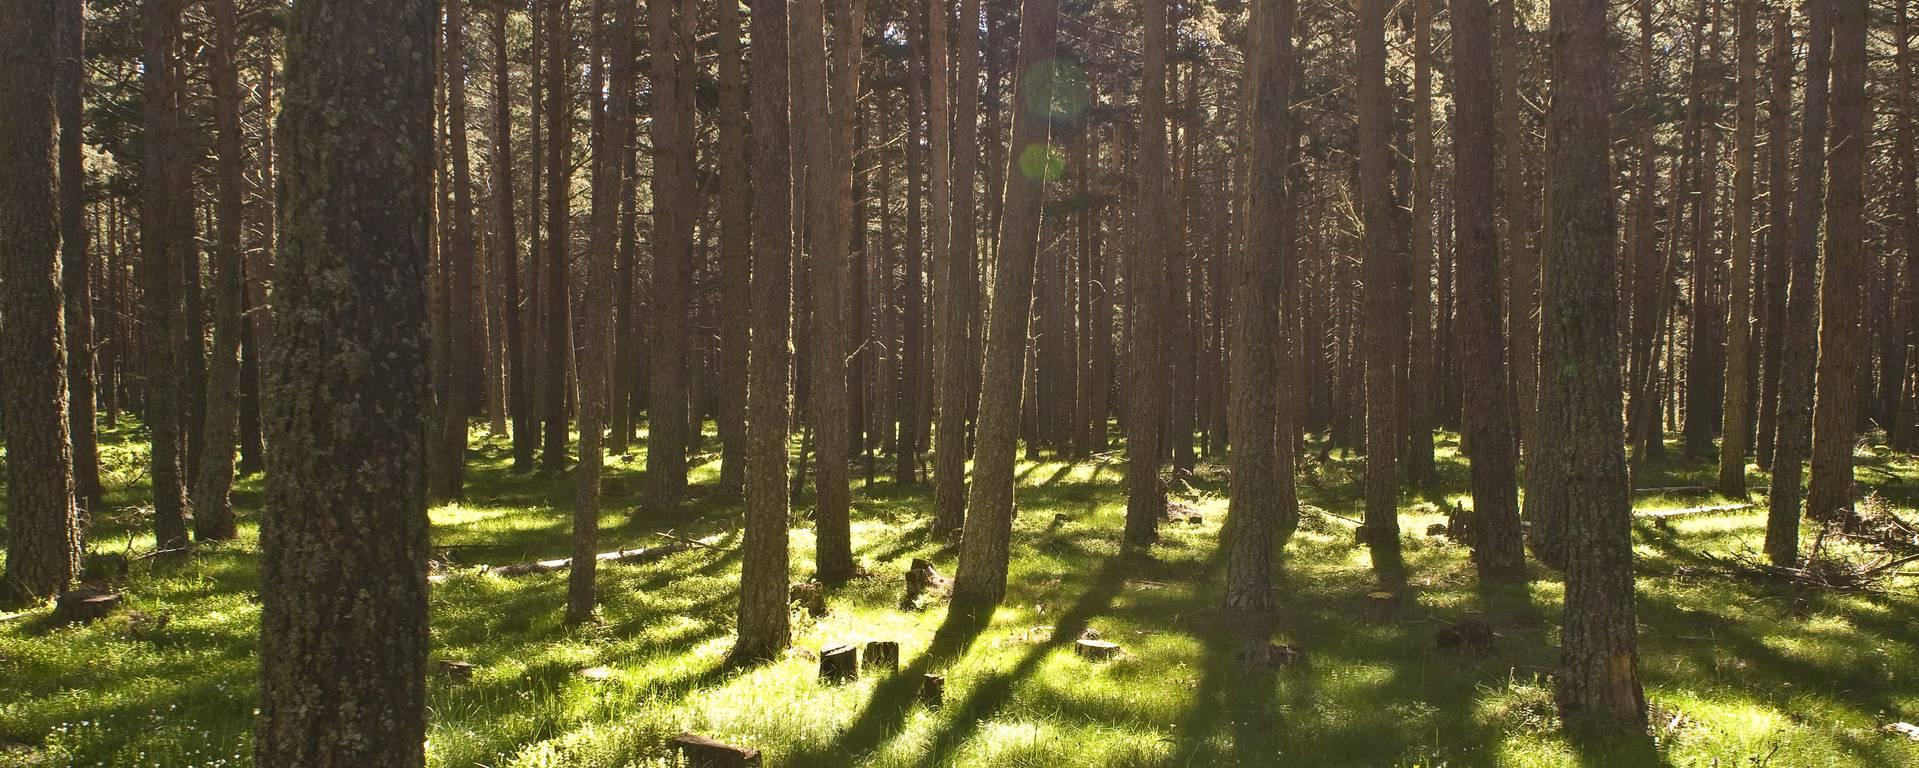 In het bos © S. Burkhardt